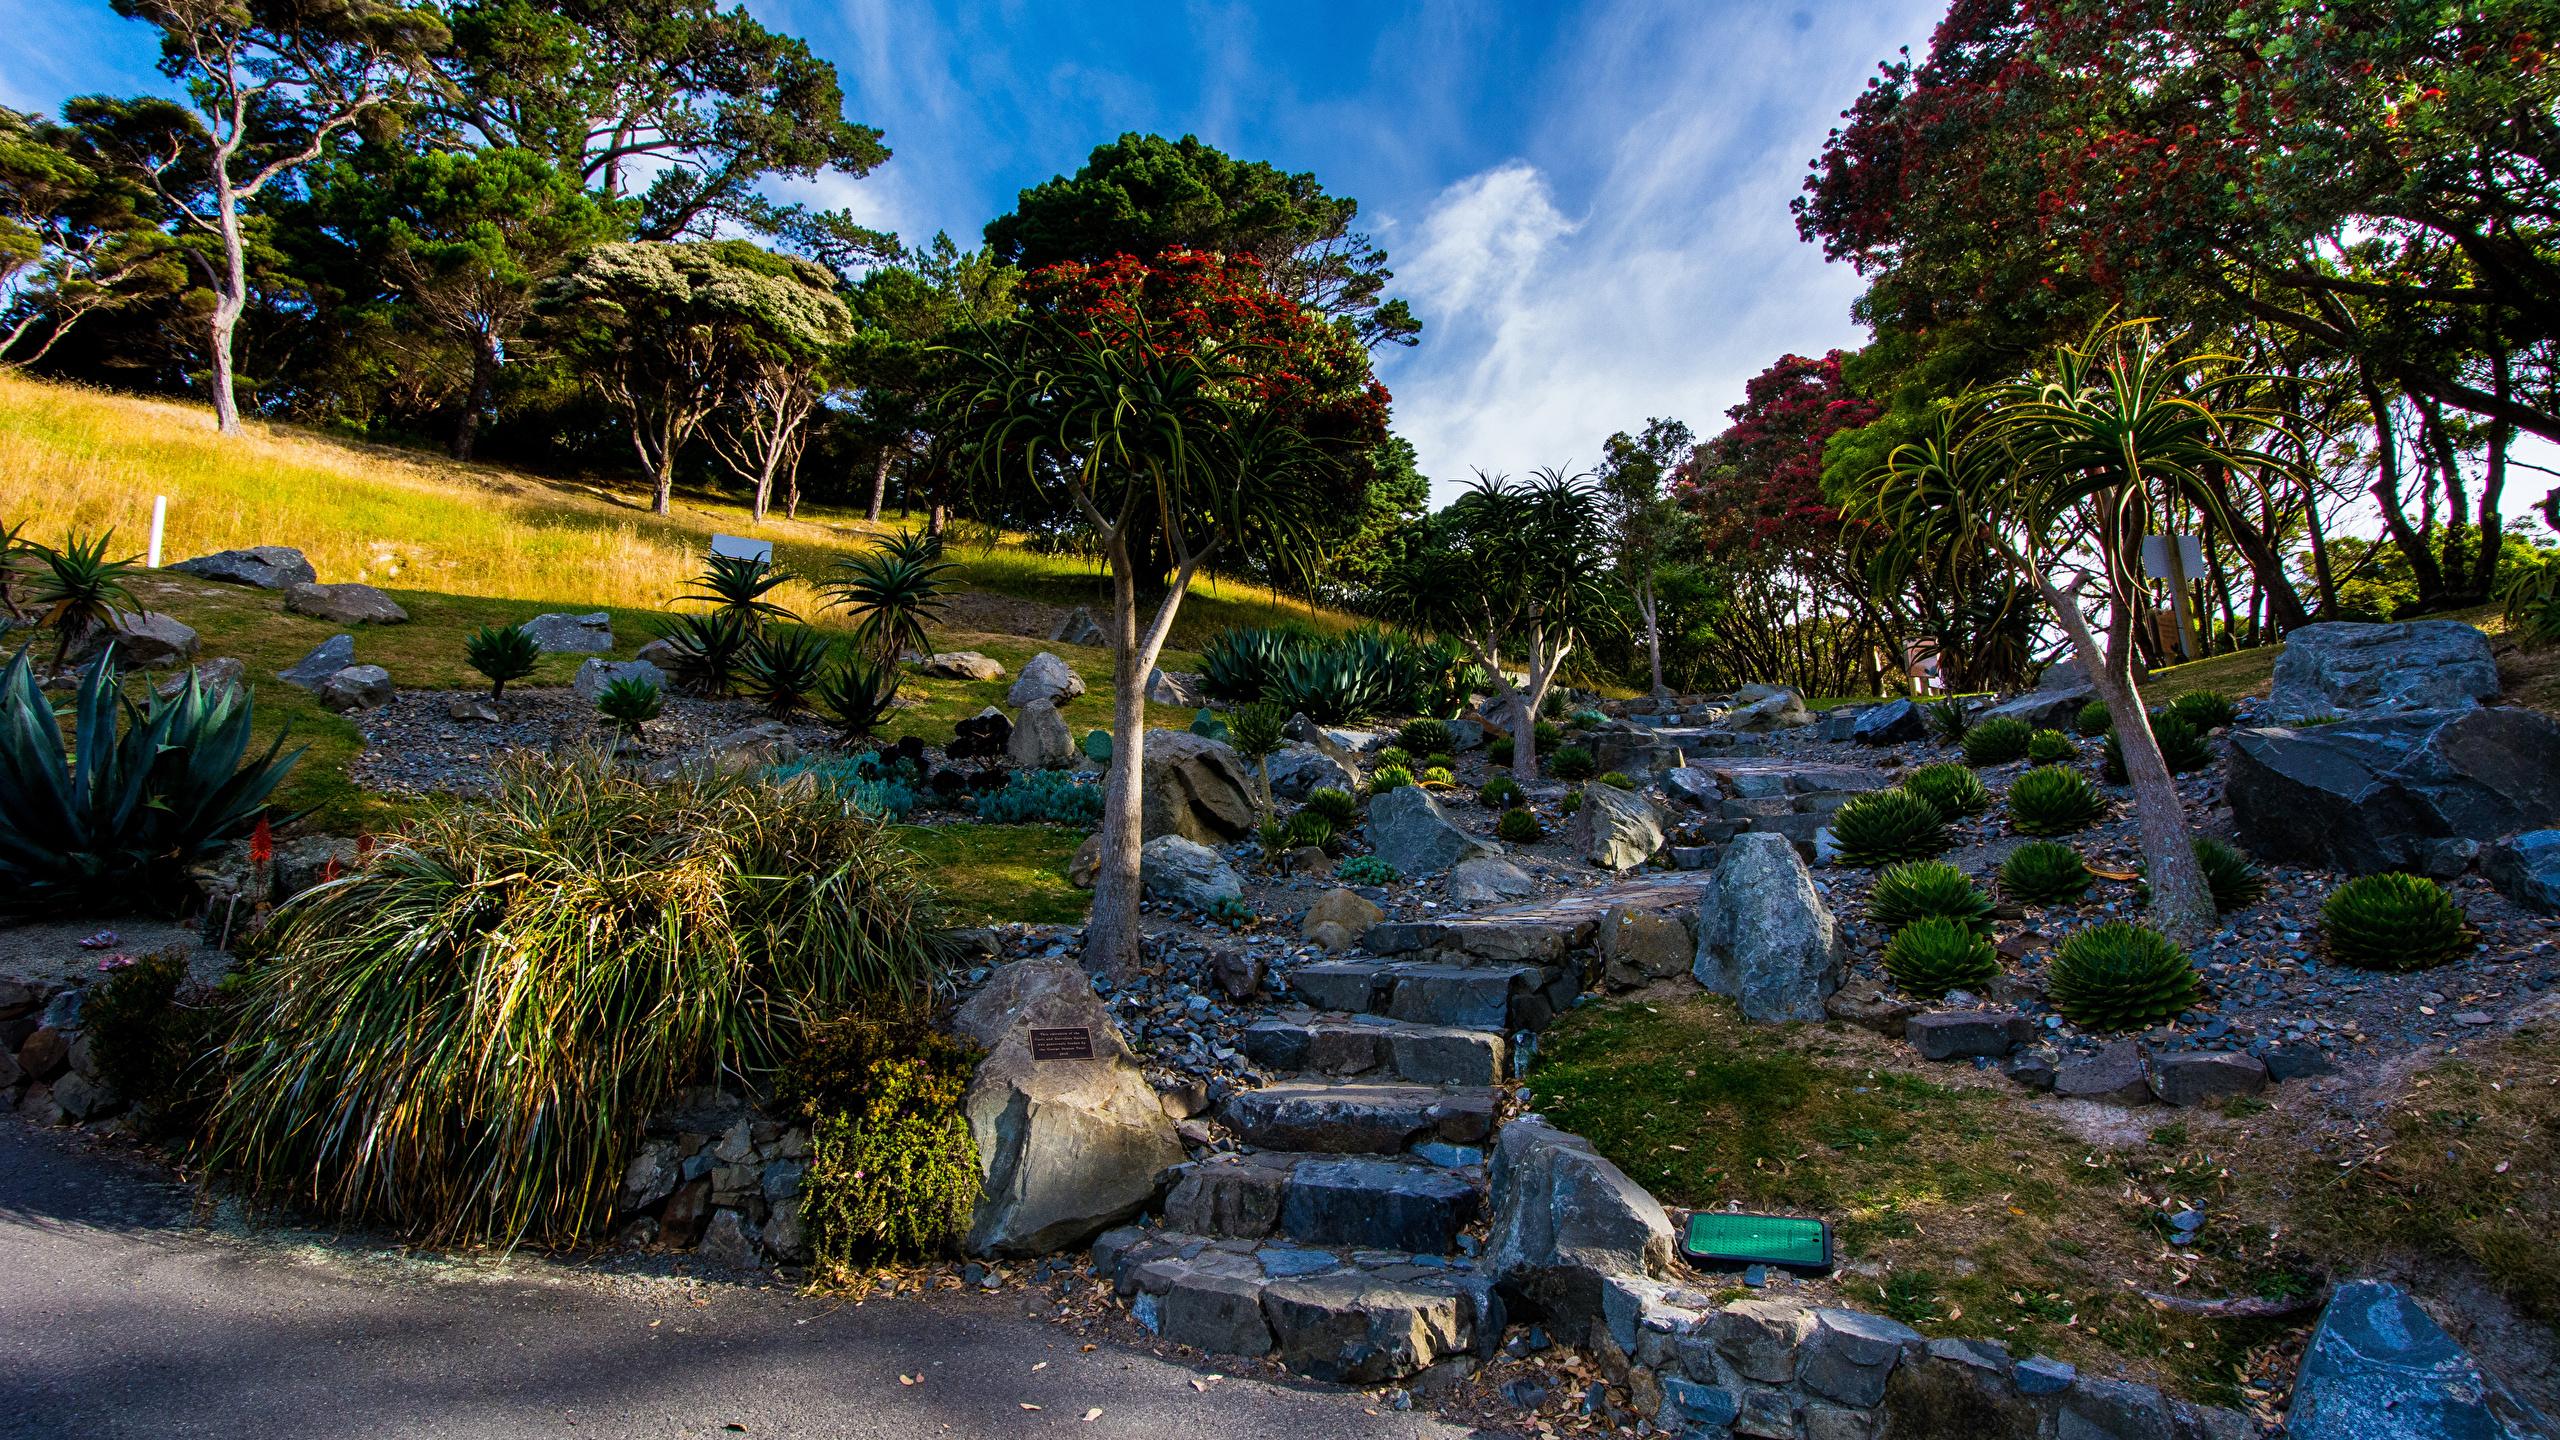 Images New Zealand Wellington Botanical garden Nature 2560x1440 2560x1440